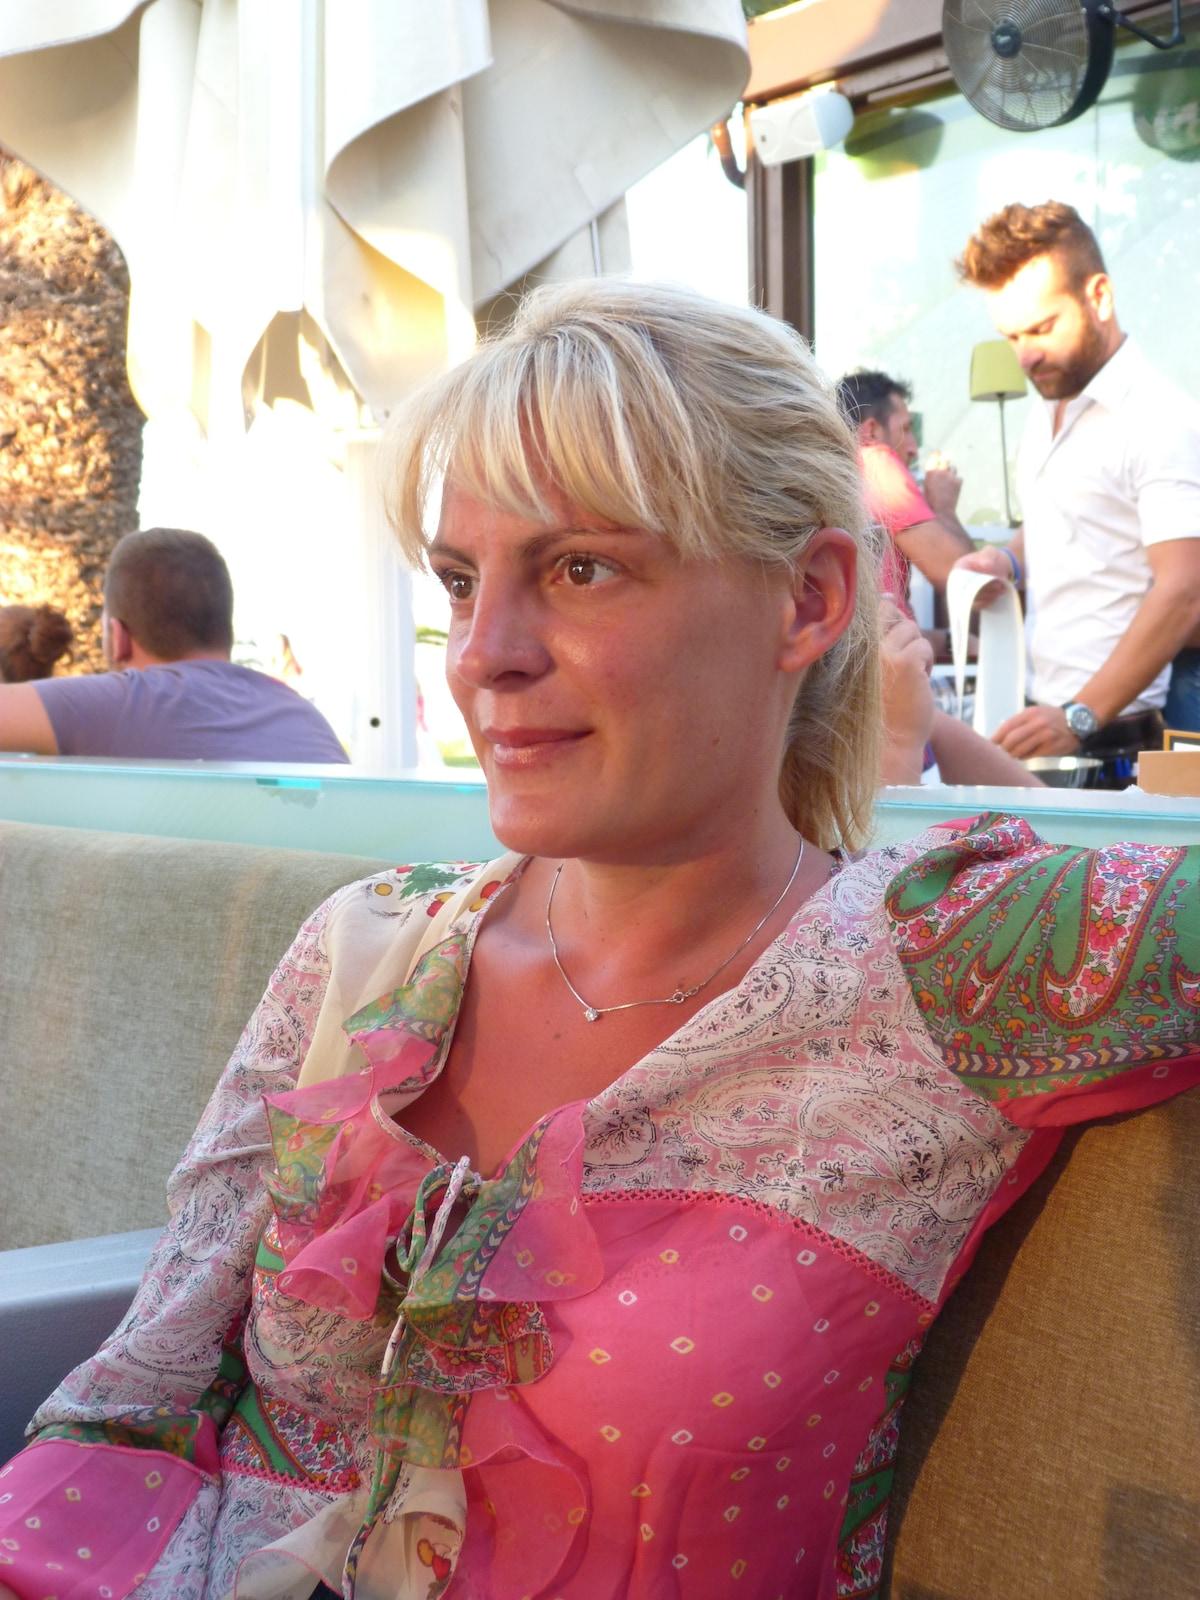 Chiara Carlotta From Milan, Italy